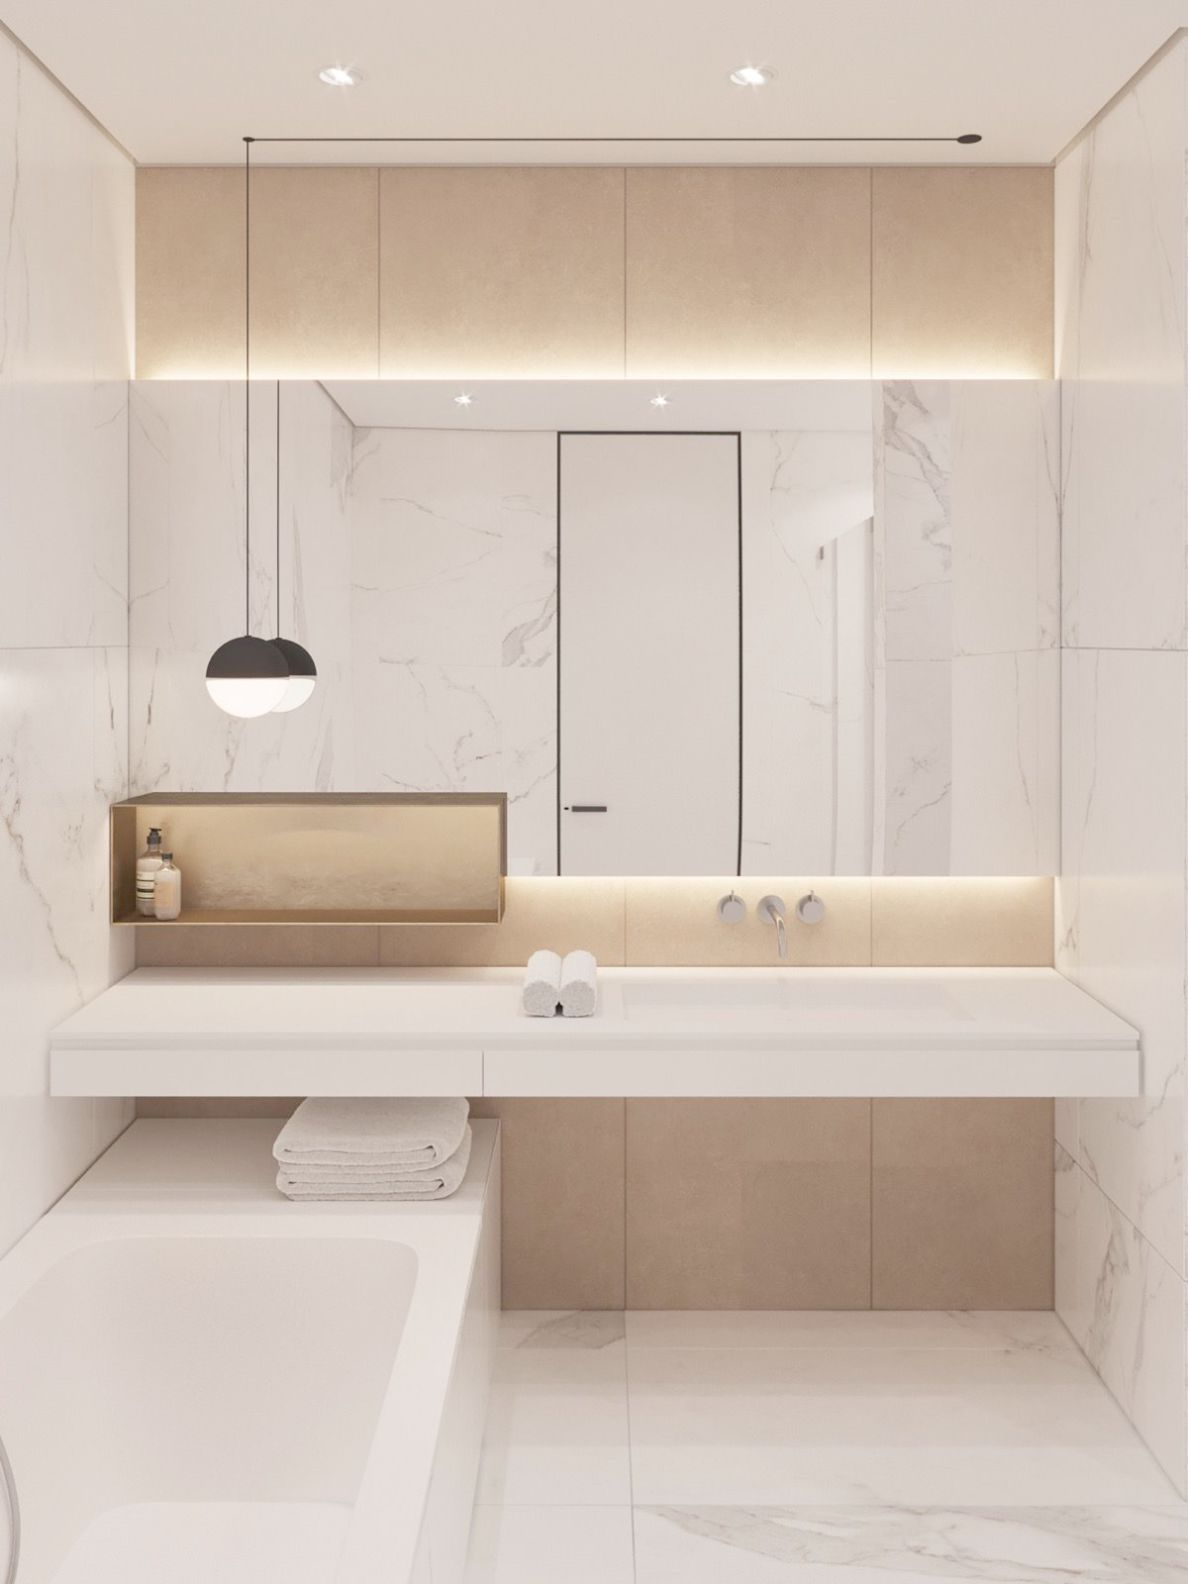 Bathroom Design Ideas Philippines My Bathroom Remodel Appleton Wi Along With Small Family Bathroom D Family Bathroom Design Top Bathroom Design Modern Bathroom